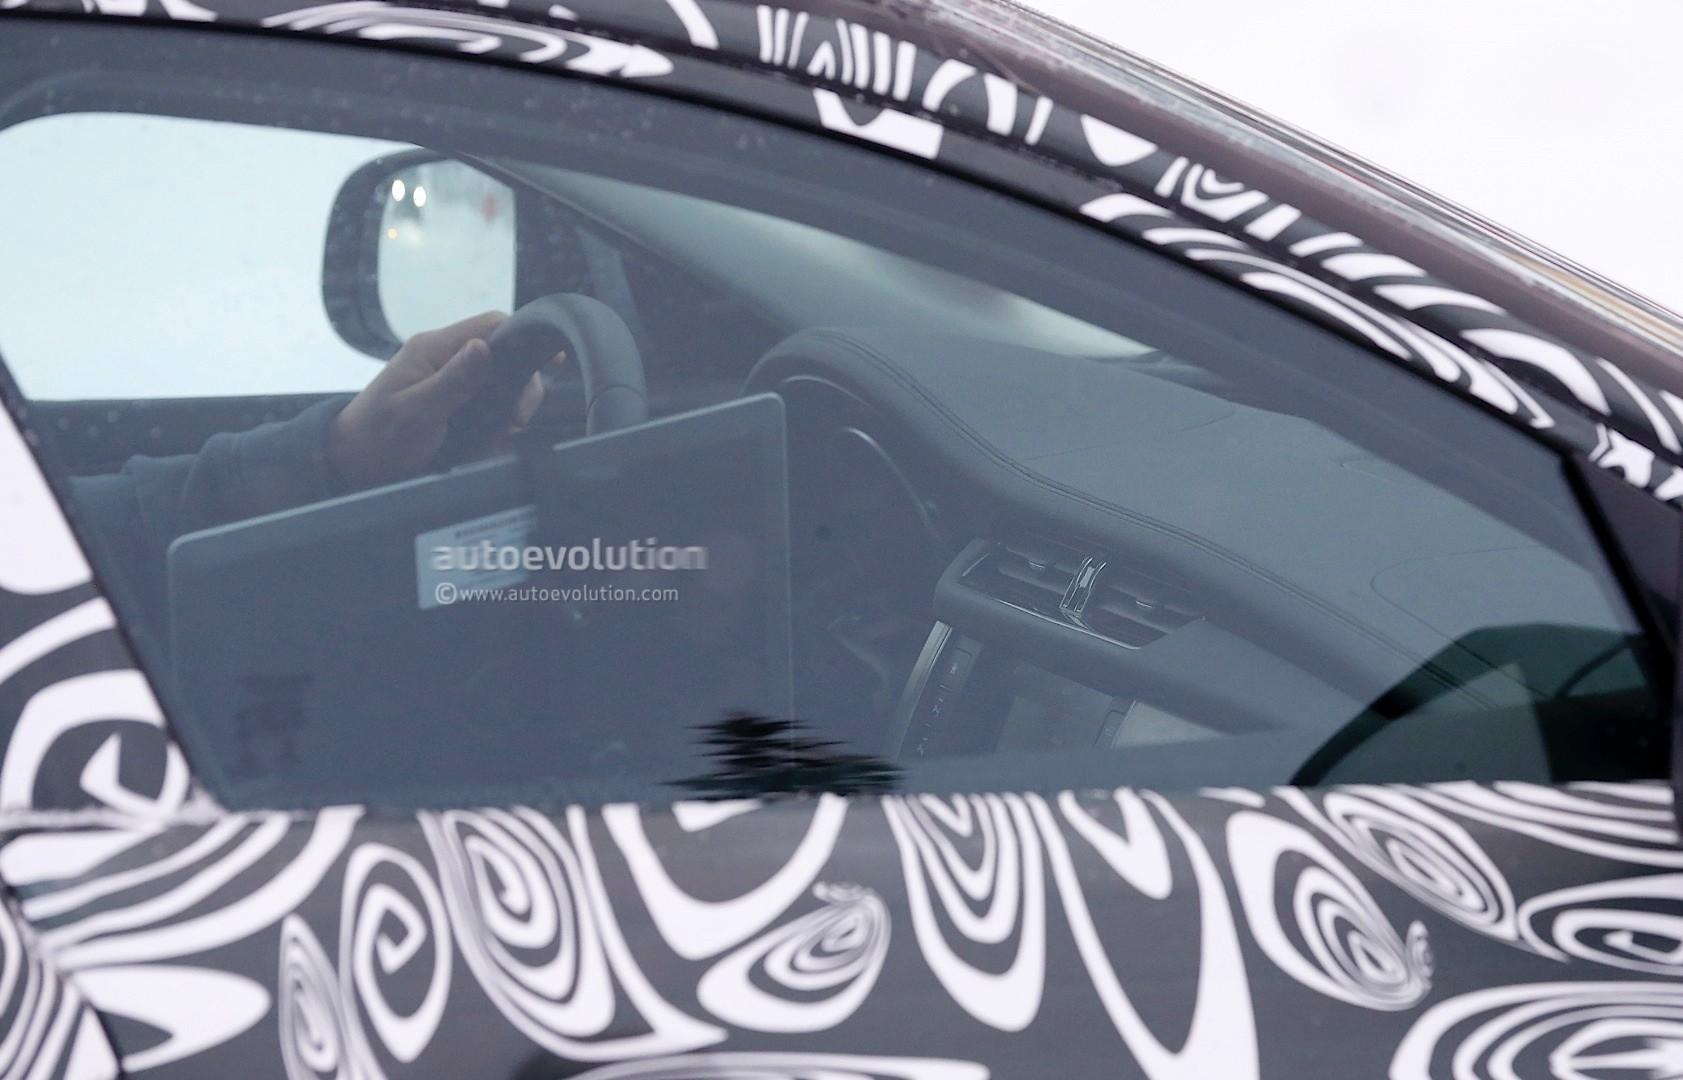 2016 - [Jaguar] XF II [X260] - Page 2 Next-jaguar-xf-spied-testing-in-the-snow-interior-sneak-peek-photo-gallery_10